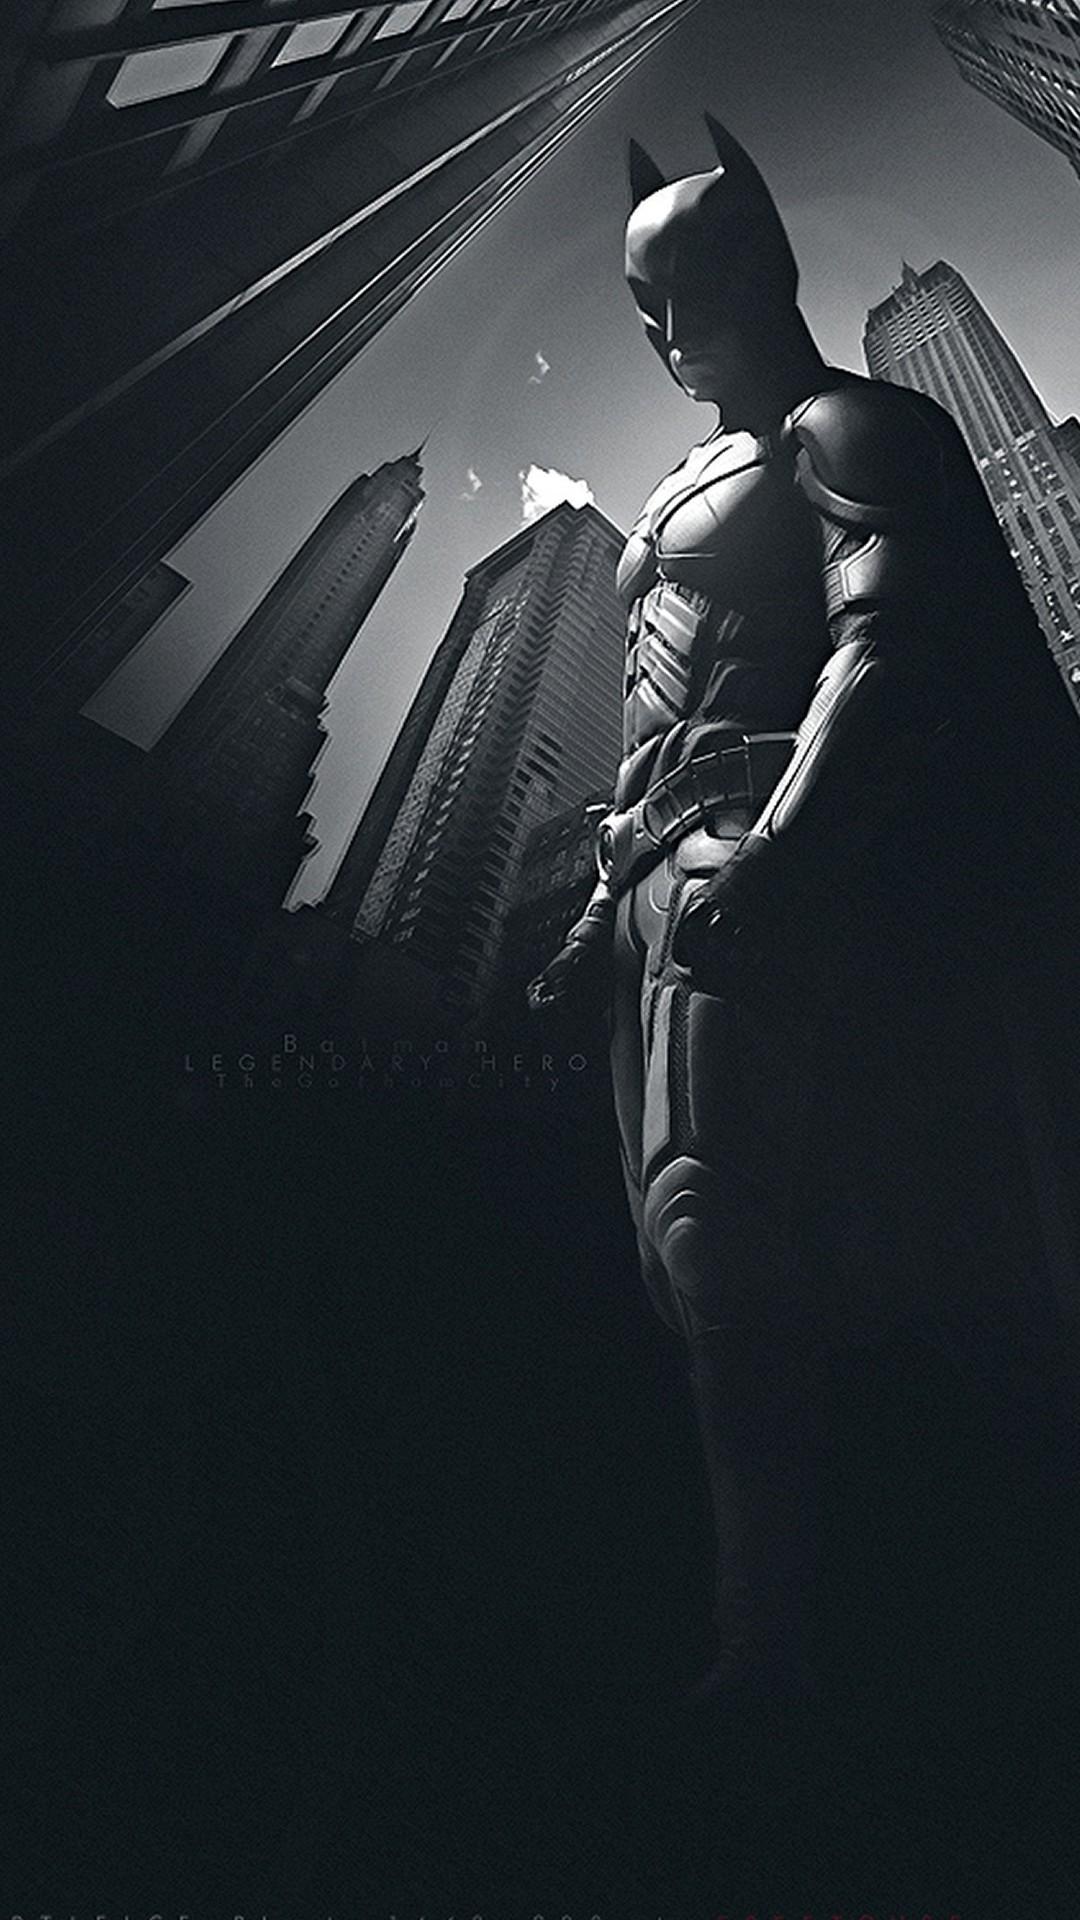 Iron Man Quotes Wallpaper Batman Dark Iphone Wallpaper Iphone Wallpapers